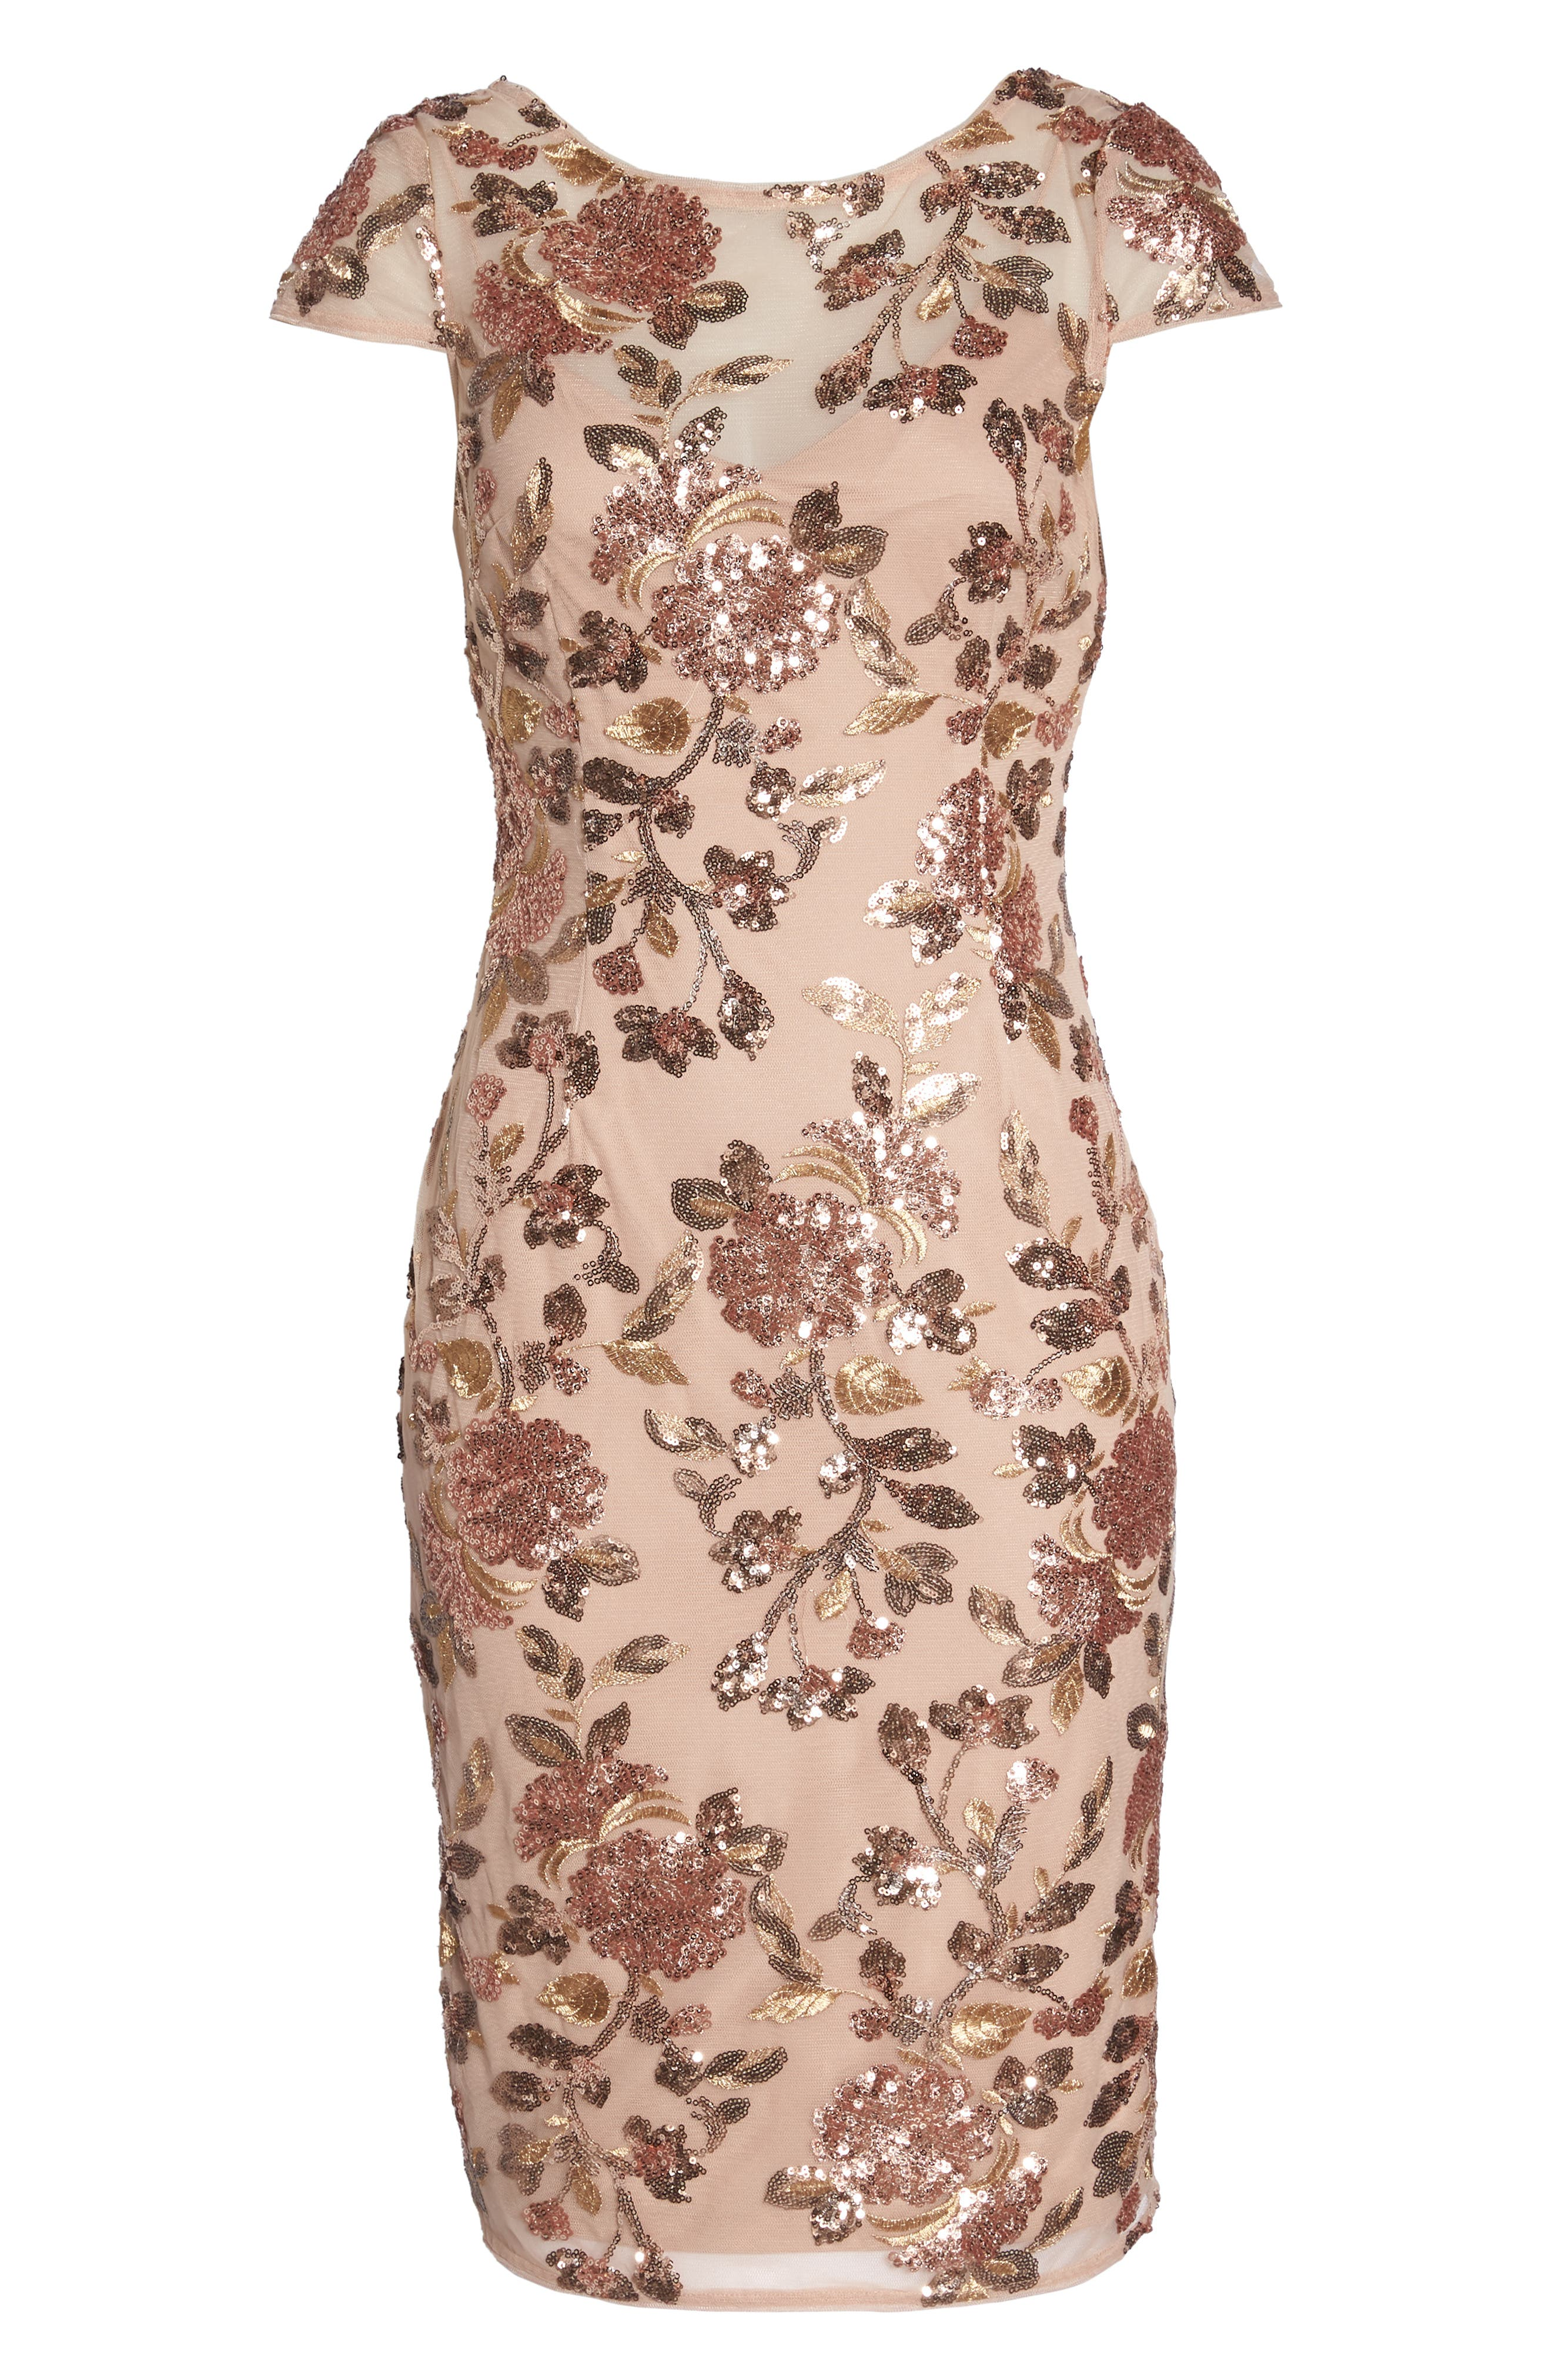 Metallic Floral Sequin Cocktail Dress,                             Alternate thumbnail 6, color,                             220